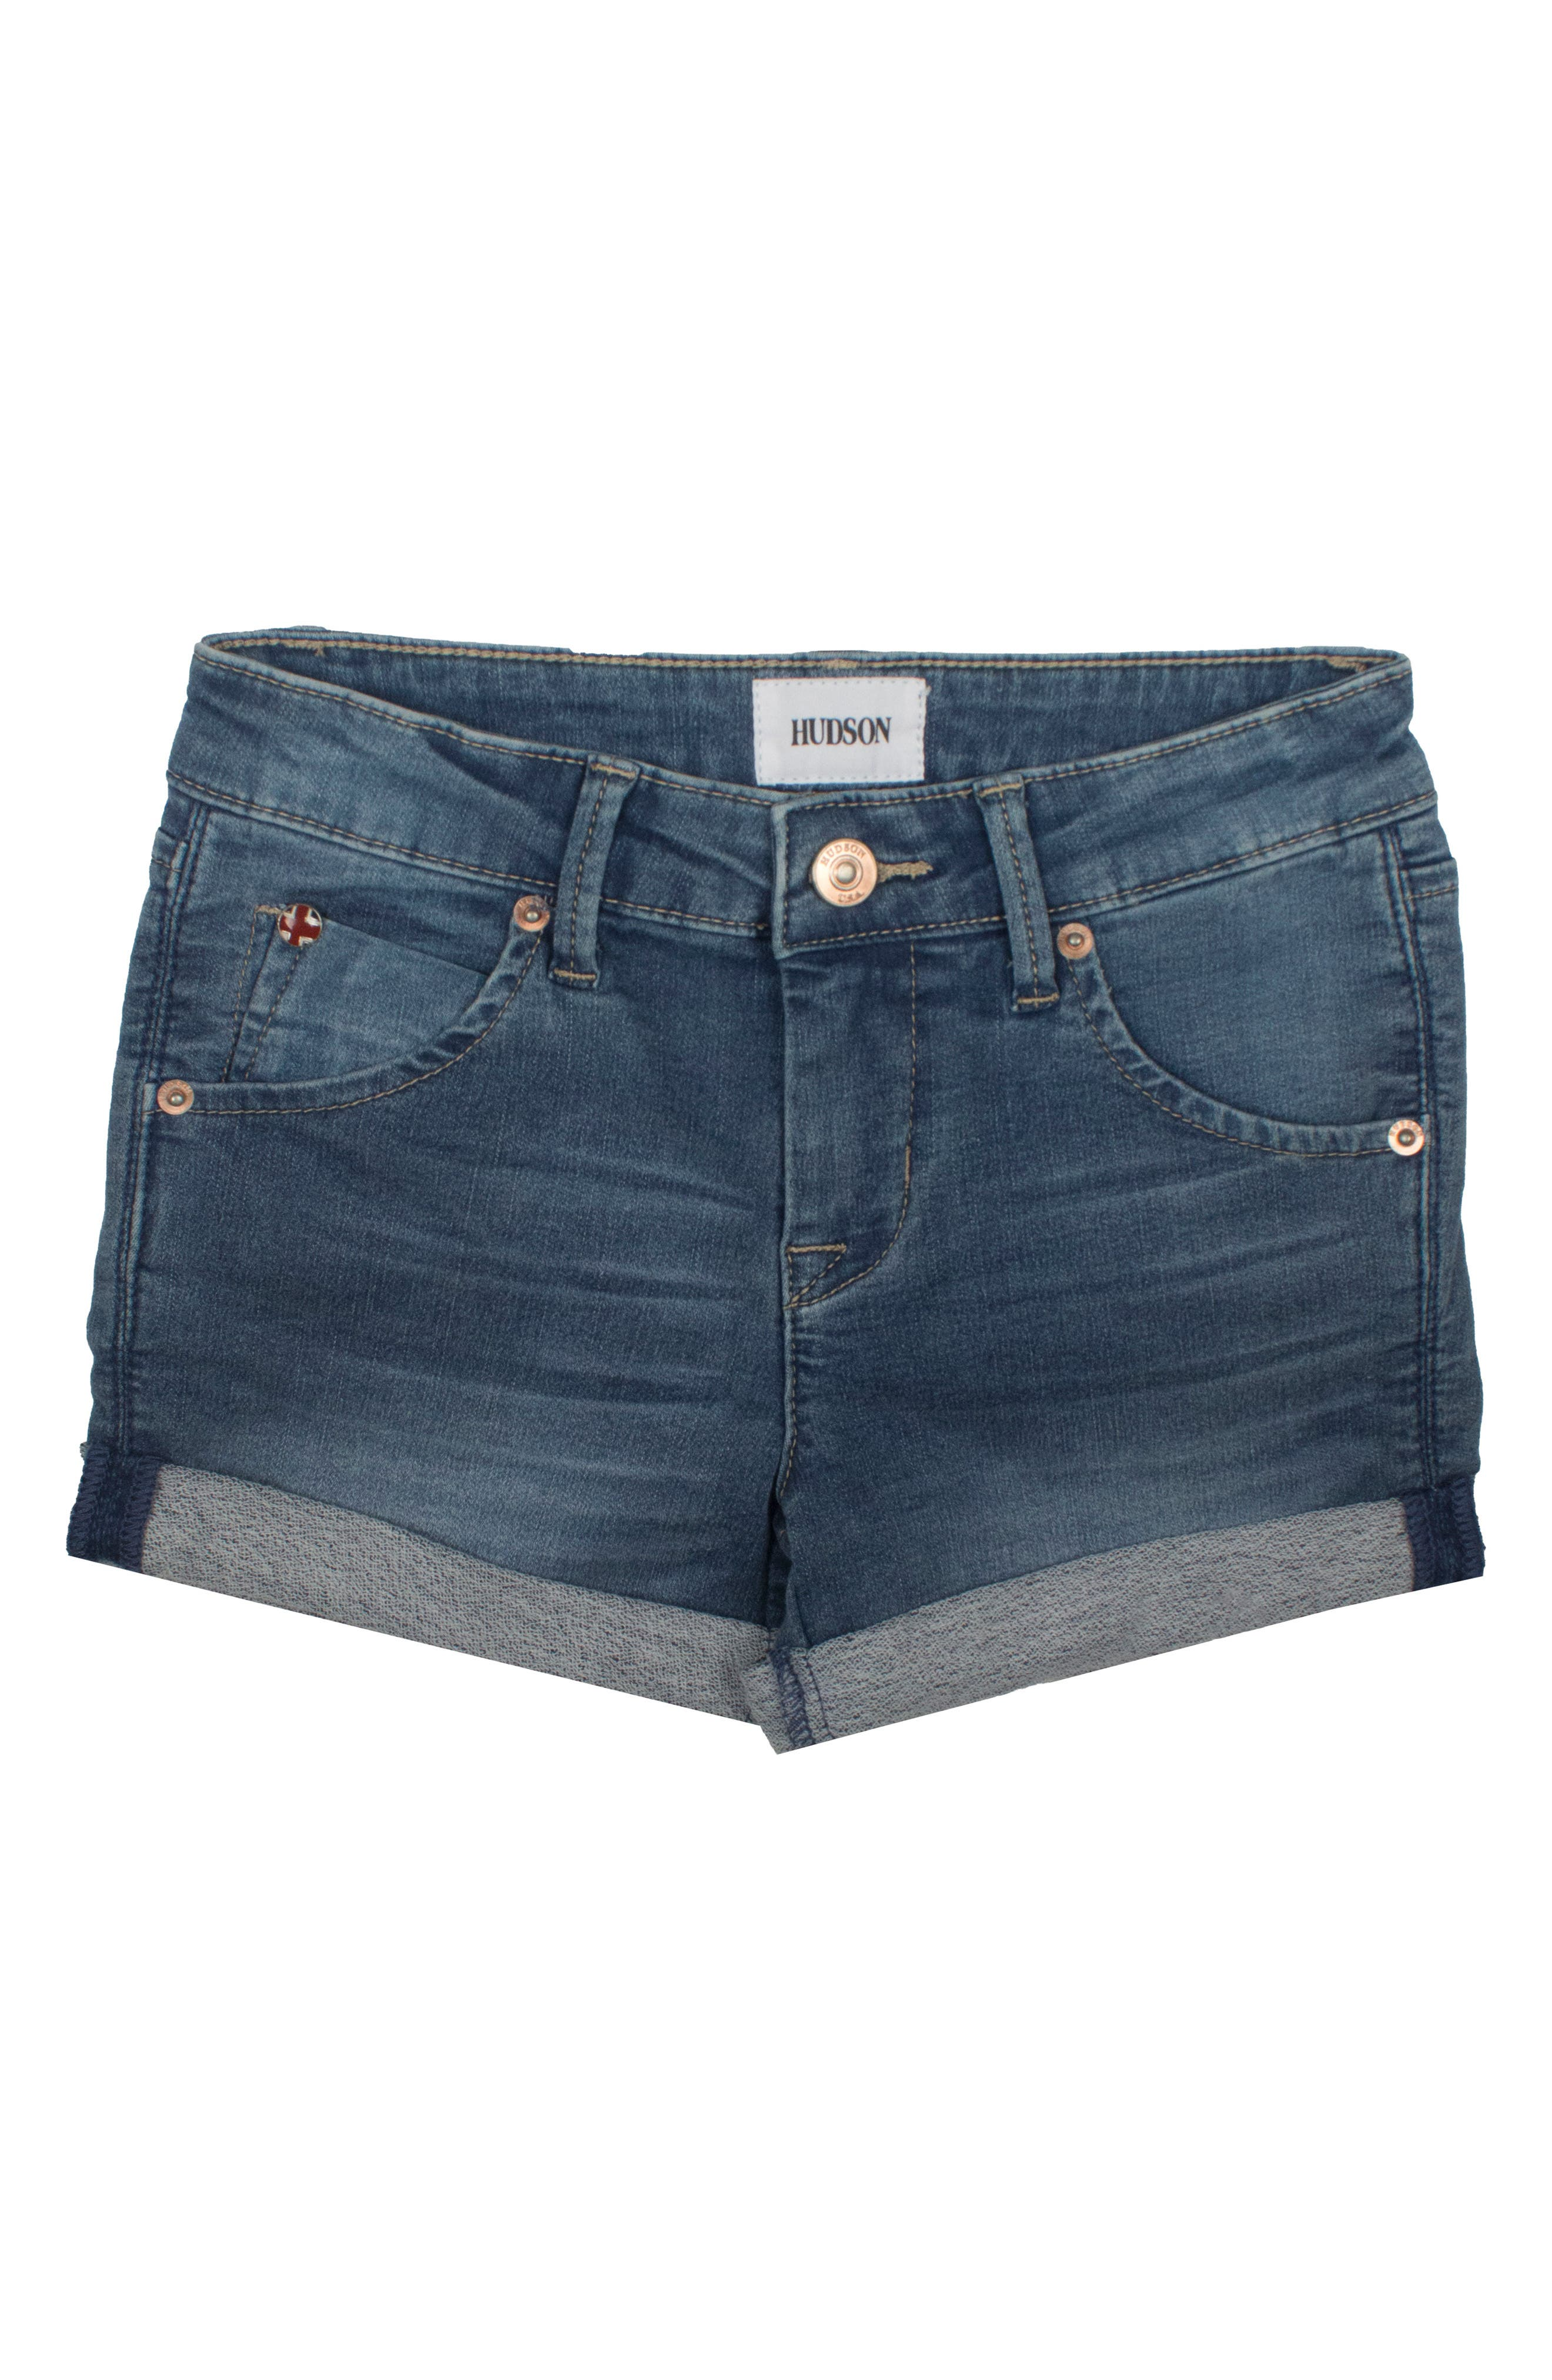 Hudson Kids Collin Roll Cuff Denim Shorts (Toddler Girls & Little Girls)